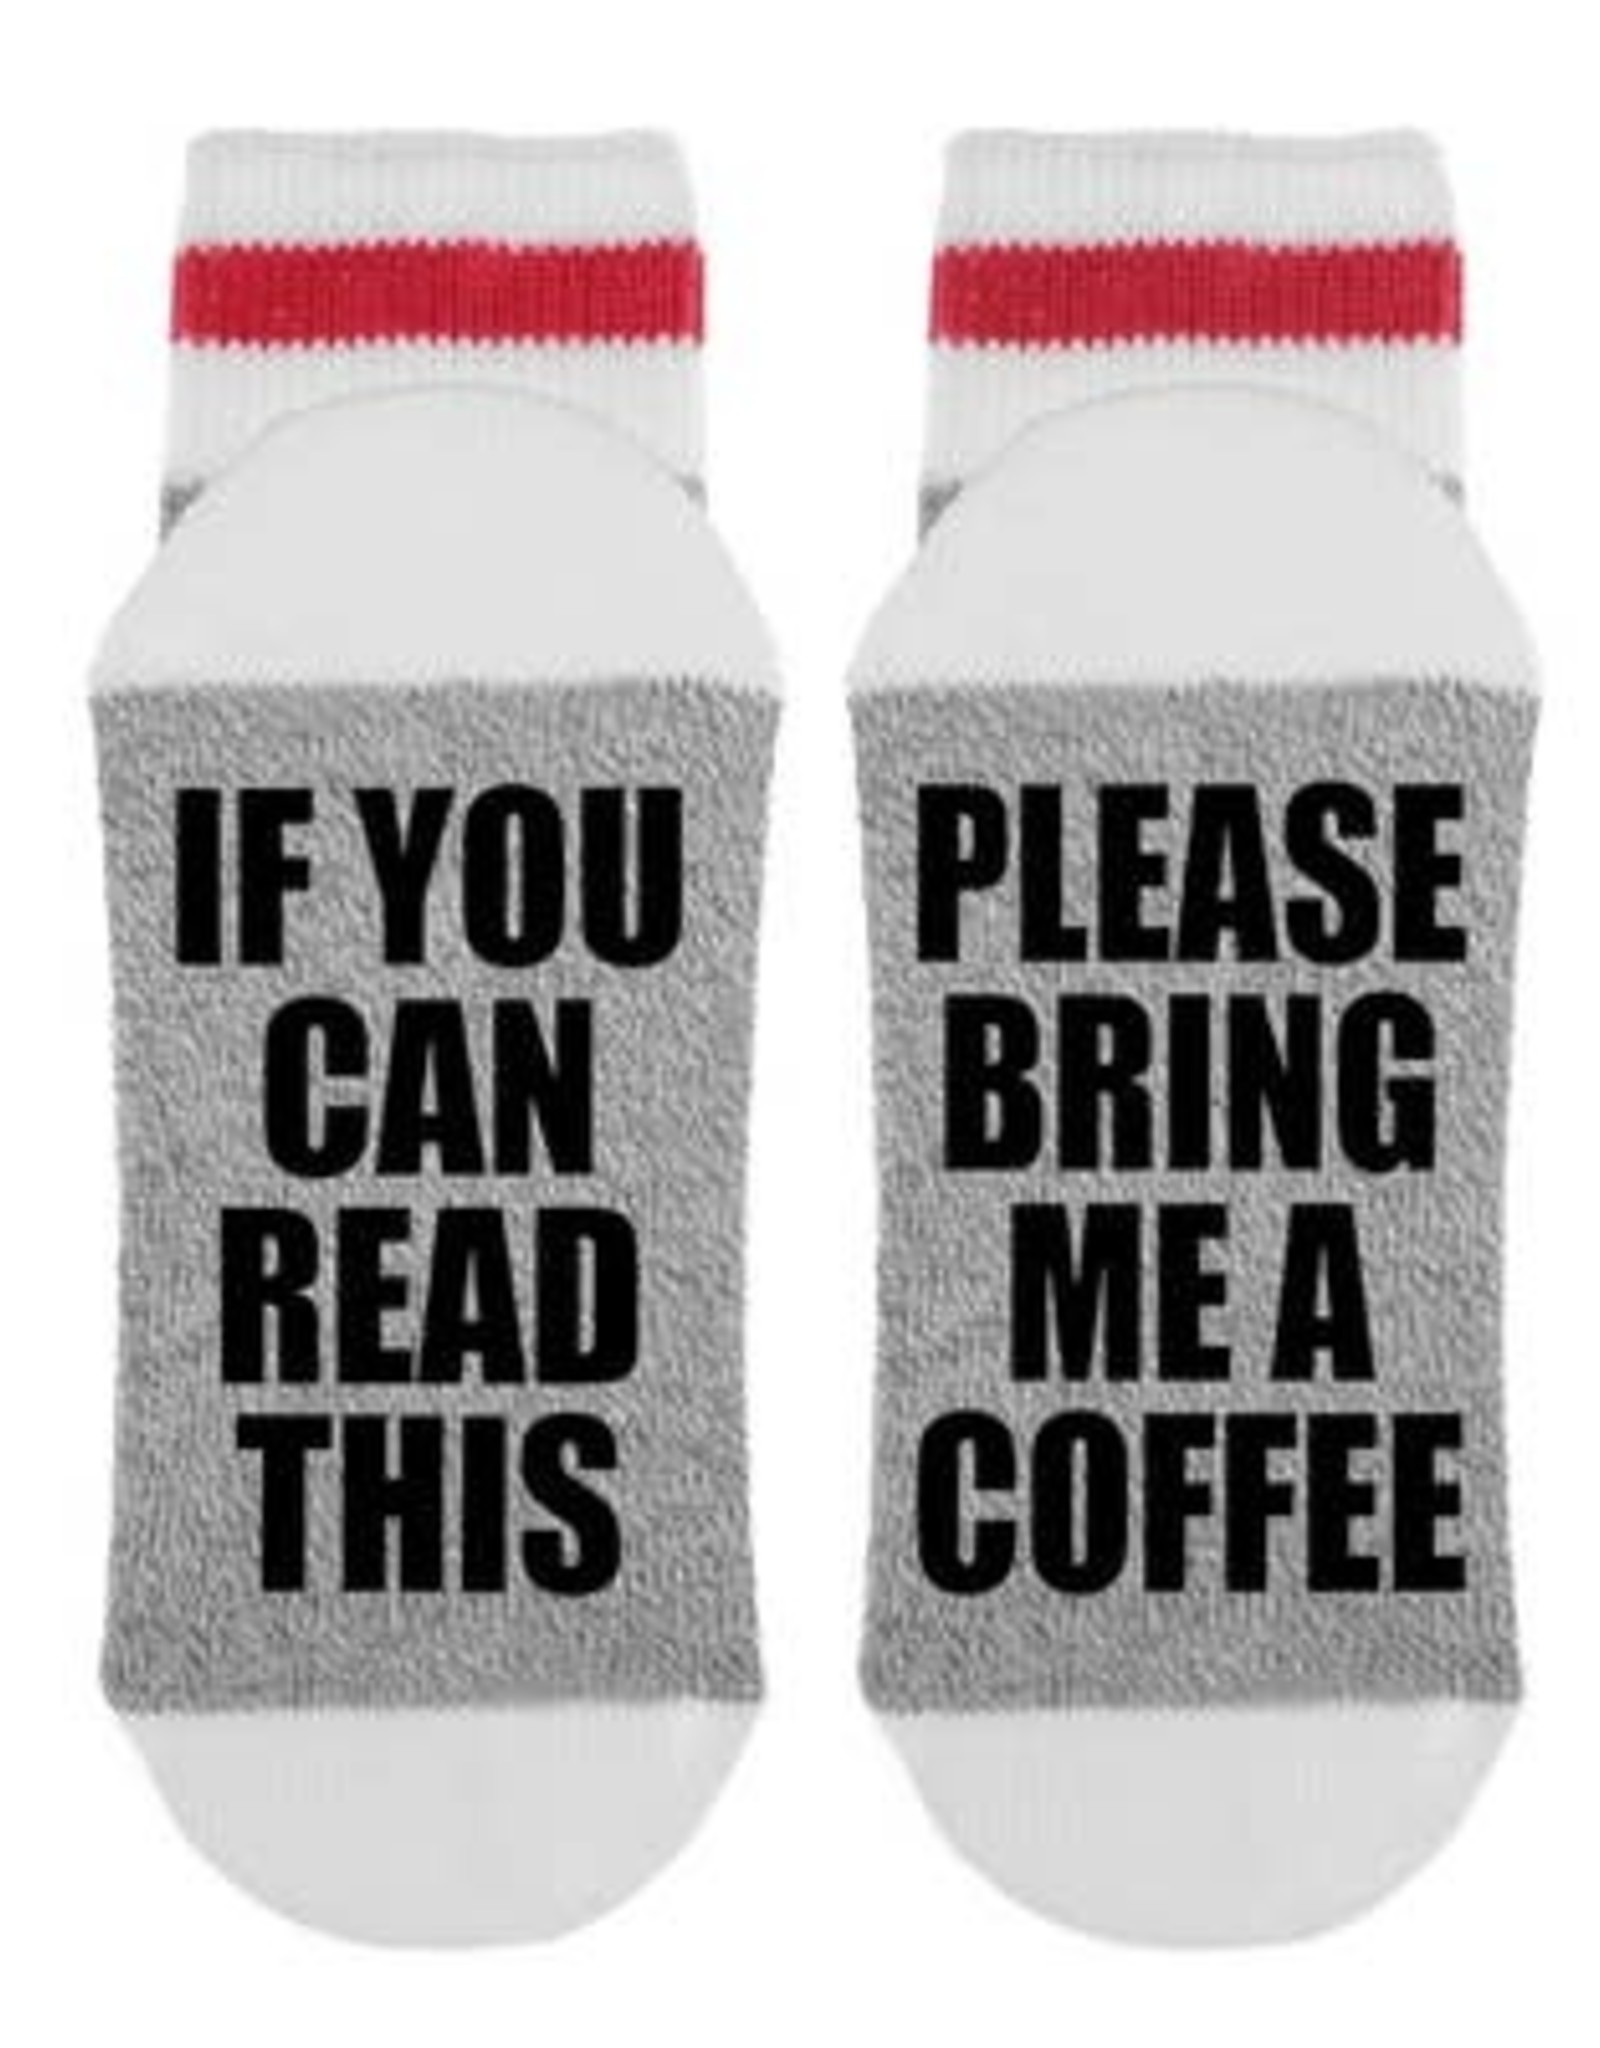 Please Bring Me a Coffee Socks